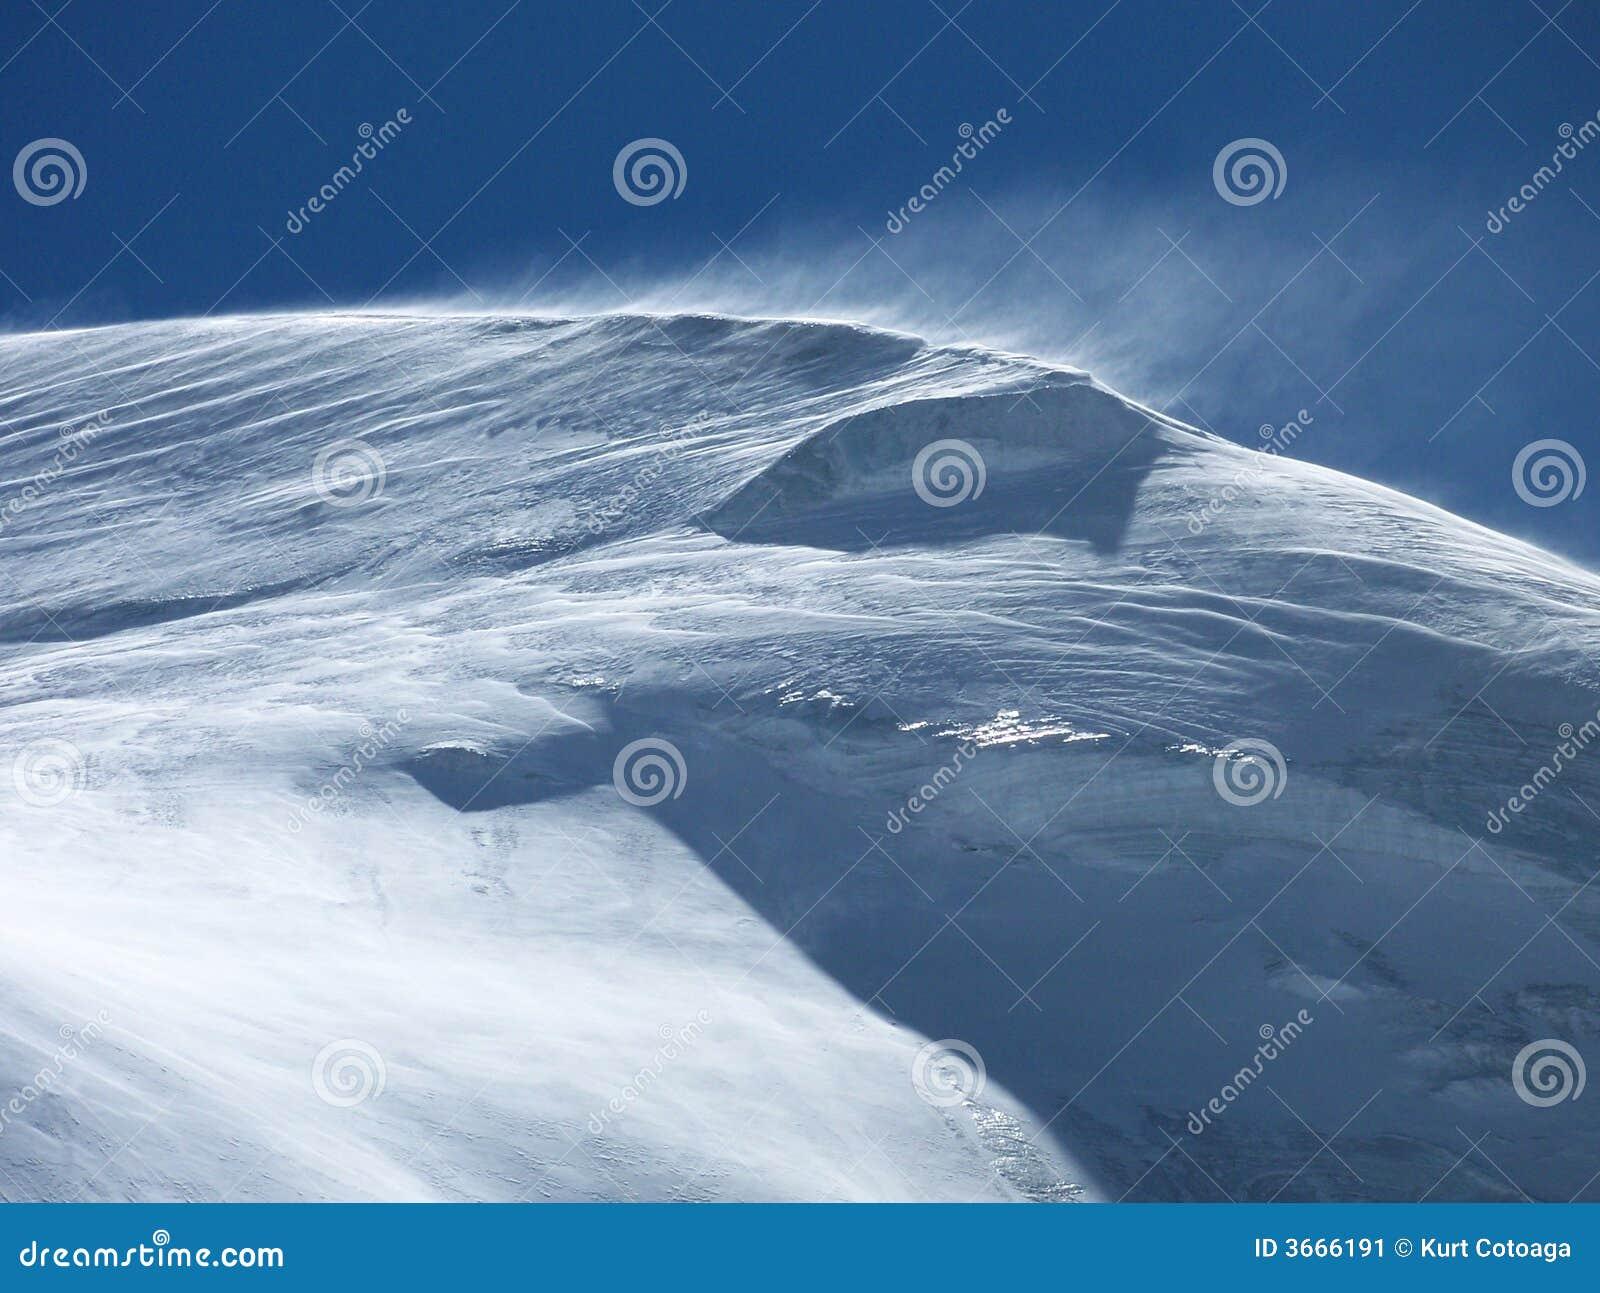 snowy mountain top